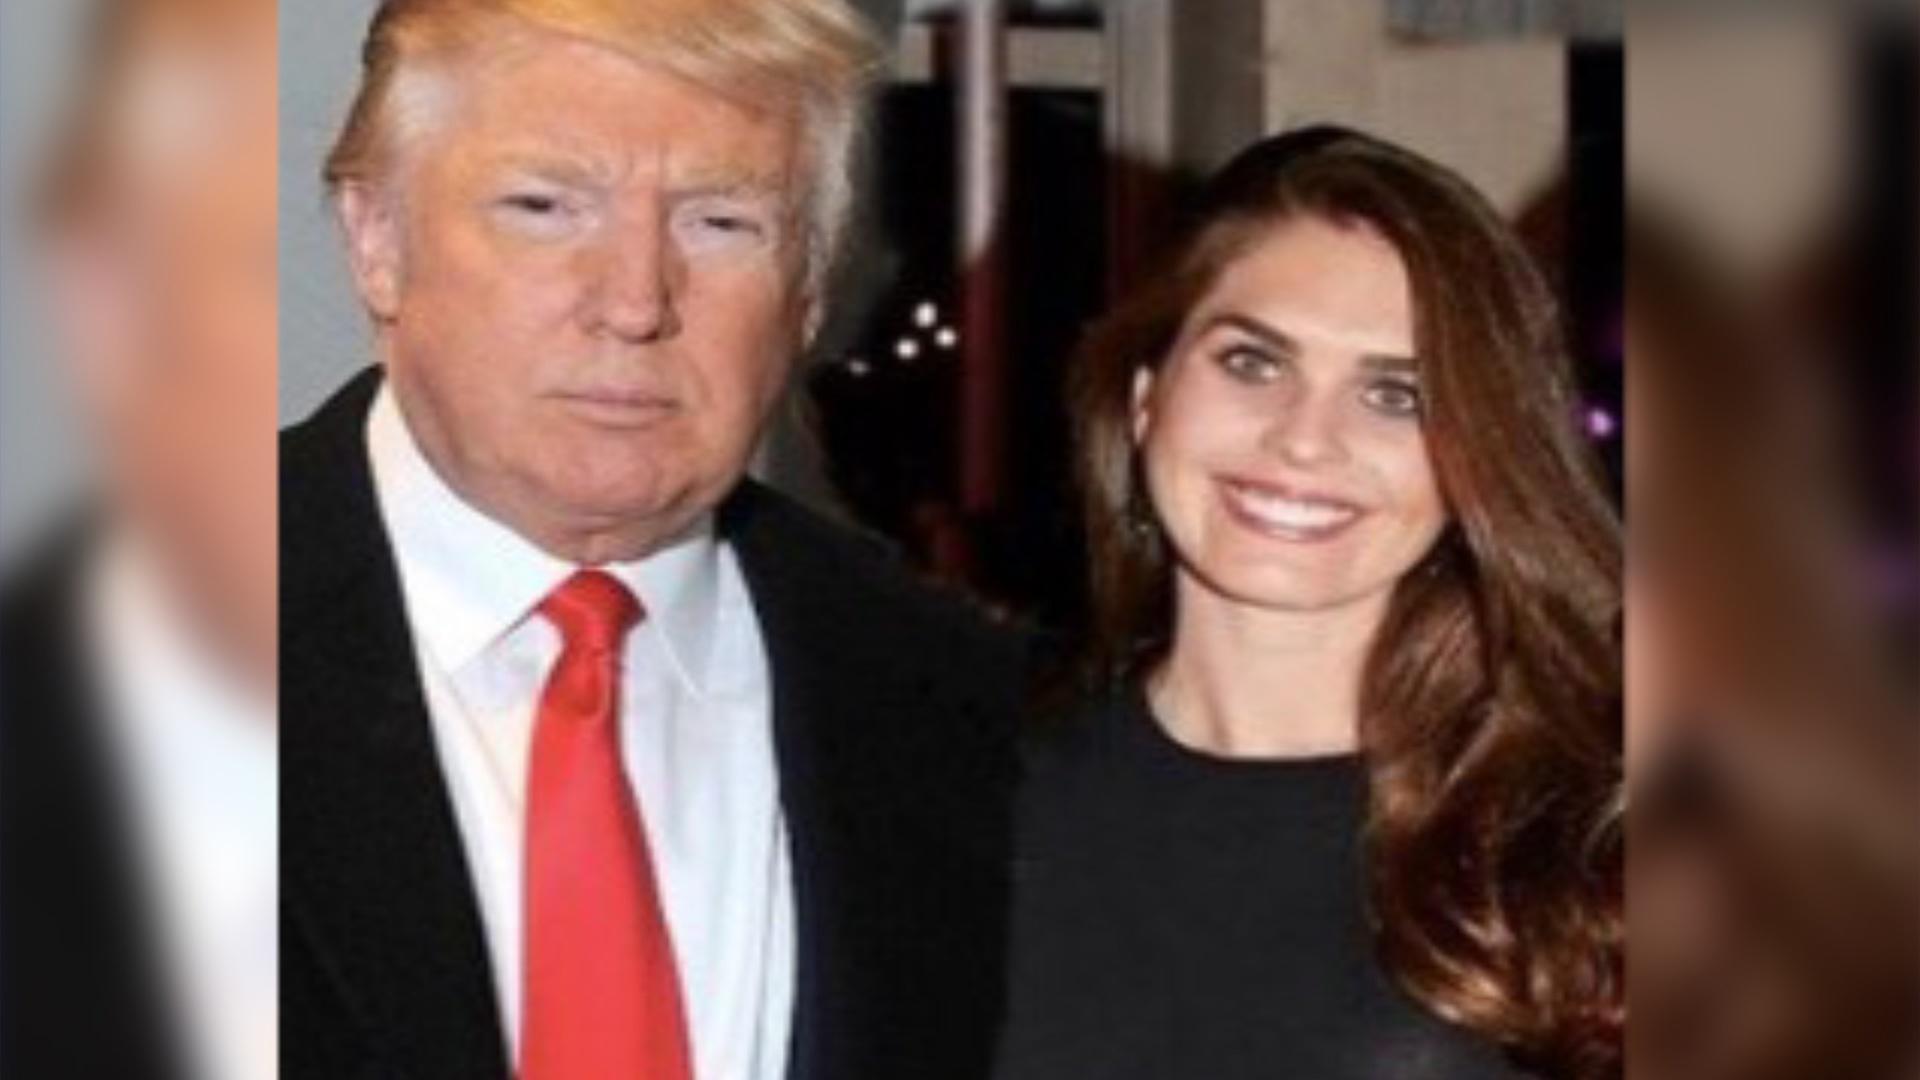 Meet Hope Hicks: Donald Trump's camera shy press secretary